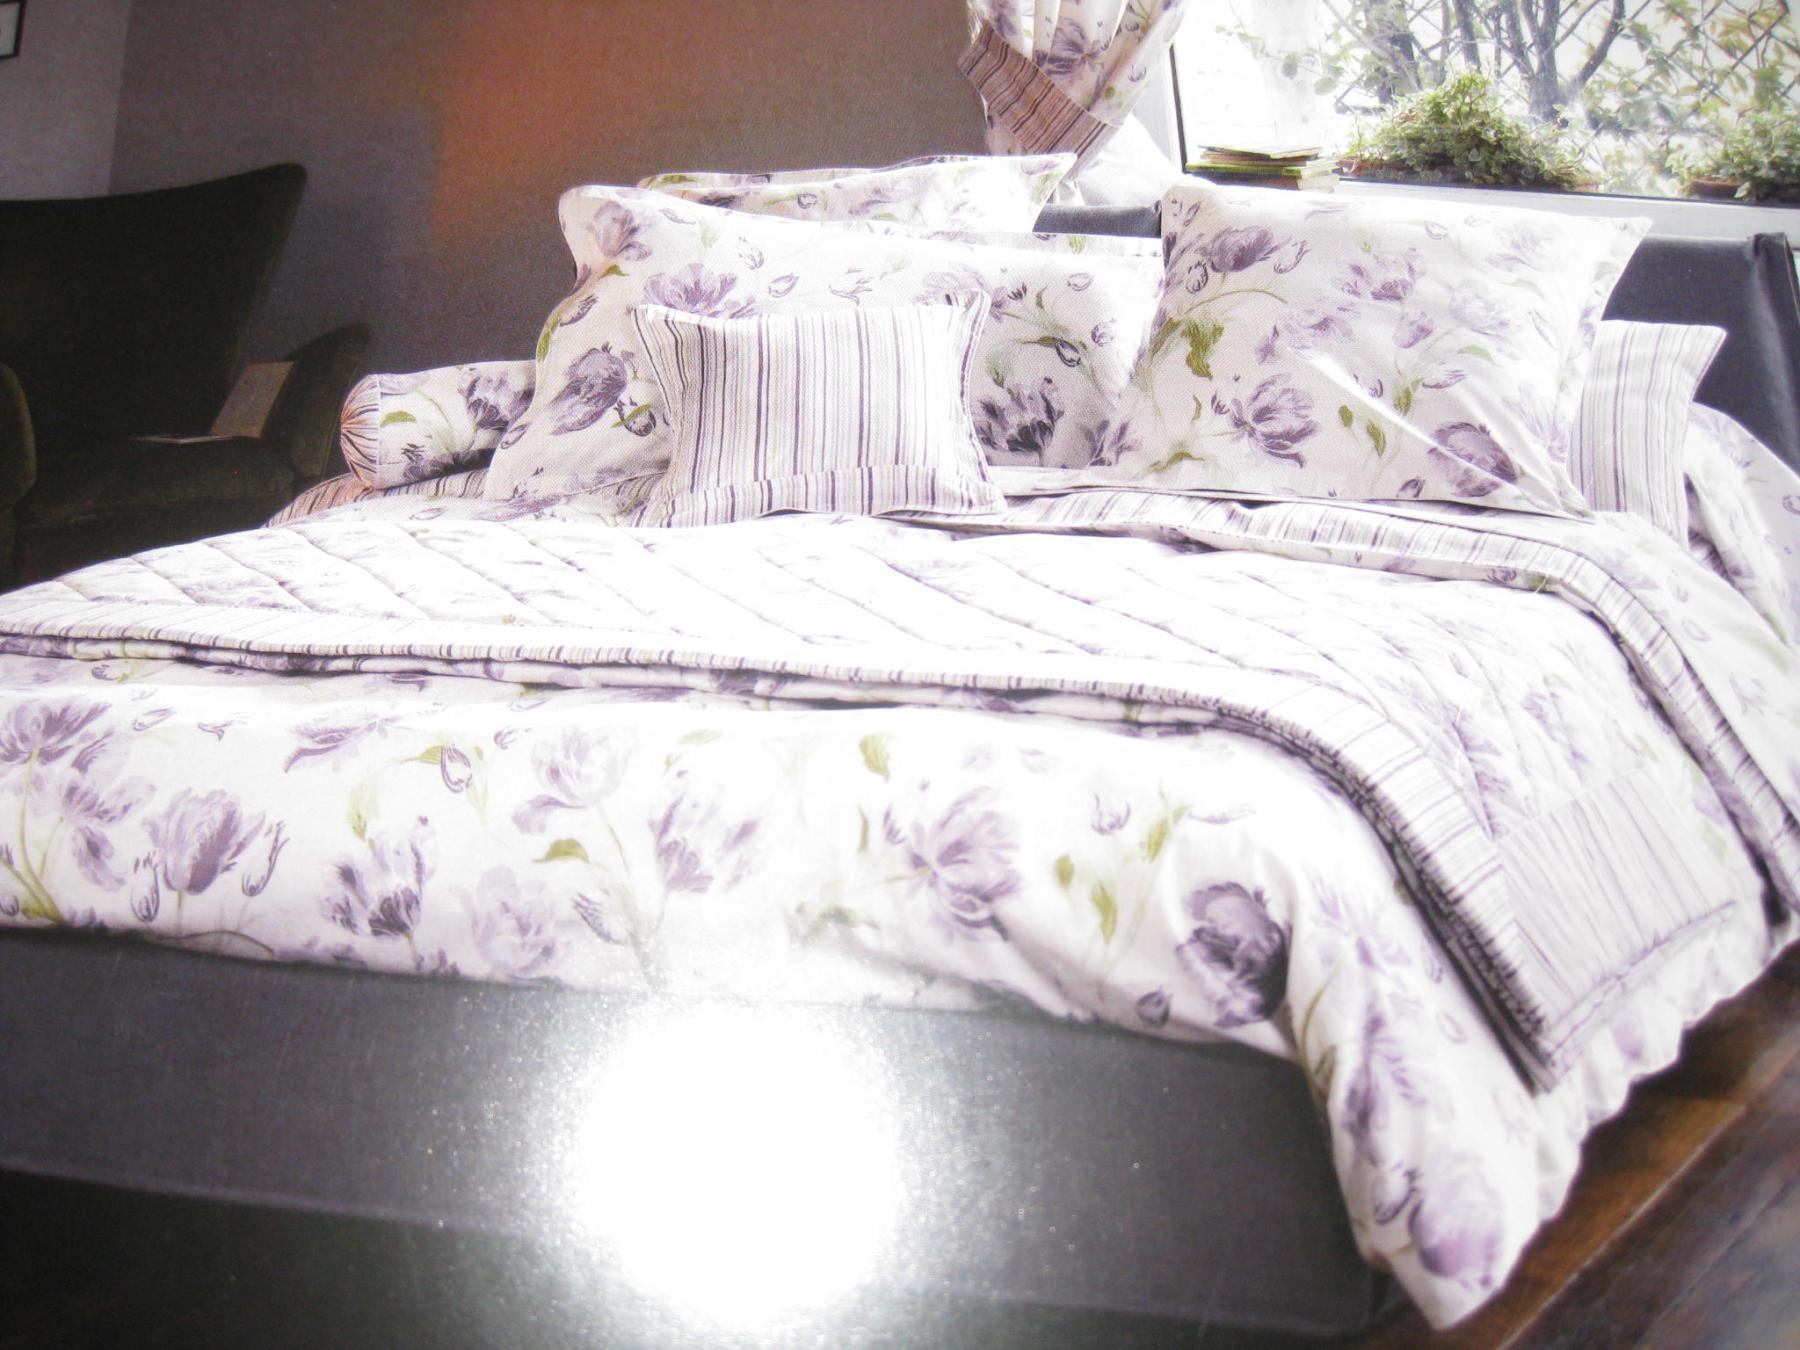 bettw sche laura ashley lakterton v8 mako satin garnitur amethyst kaufen bei betten krebs. Black Bedroom Furniture Sets. Home Design Ideas